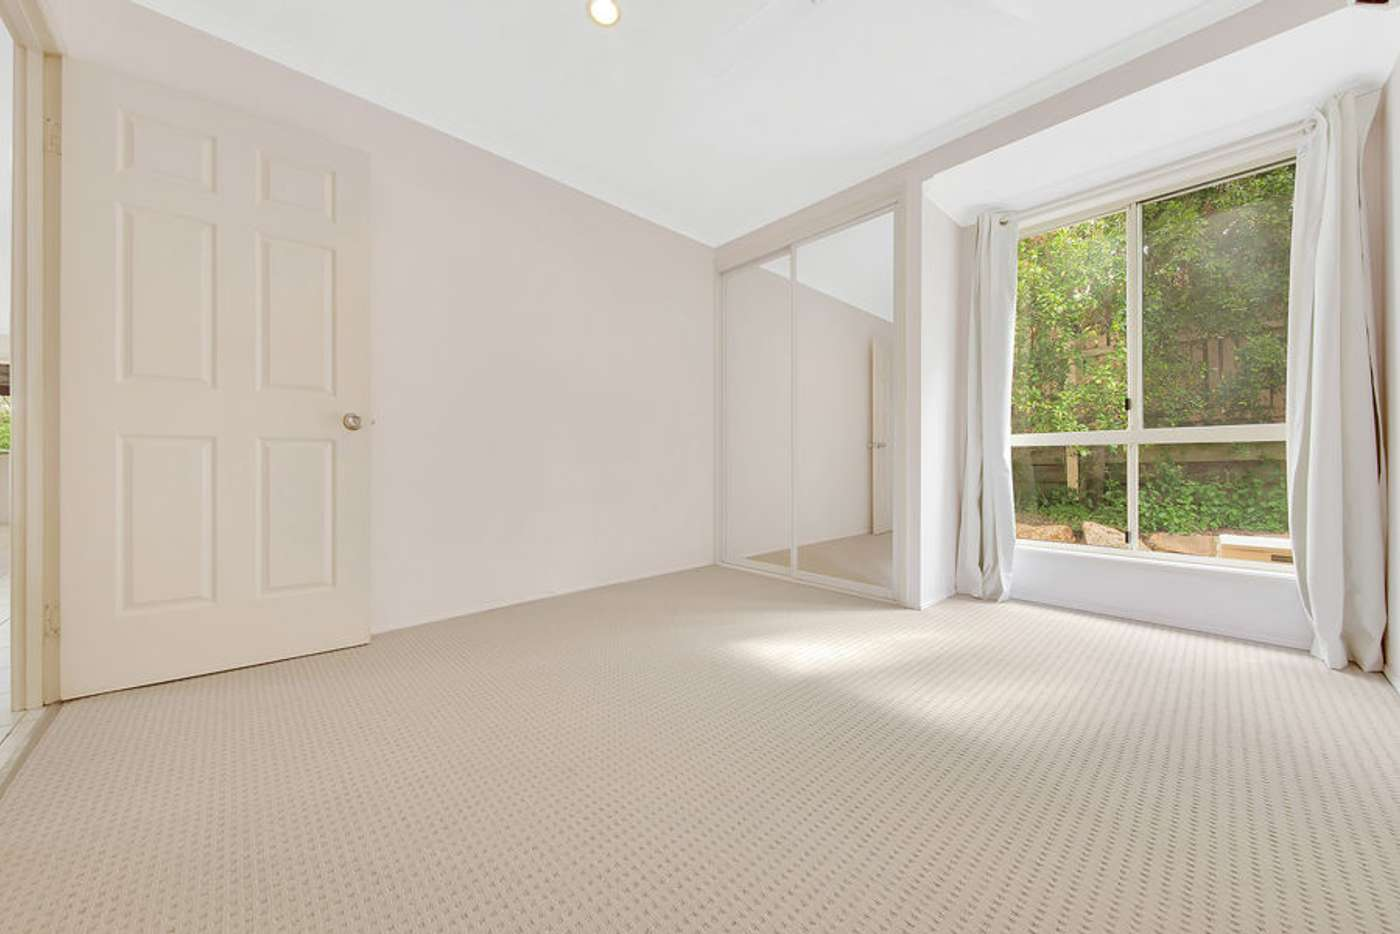 Seventh view of Homely house listing, 32 Brin Street, Boyne Island QLD 4680